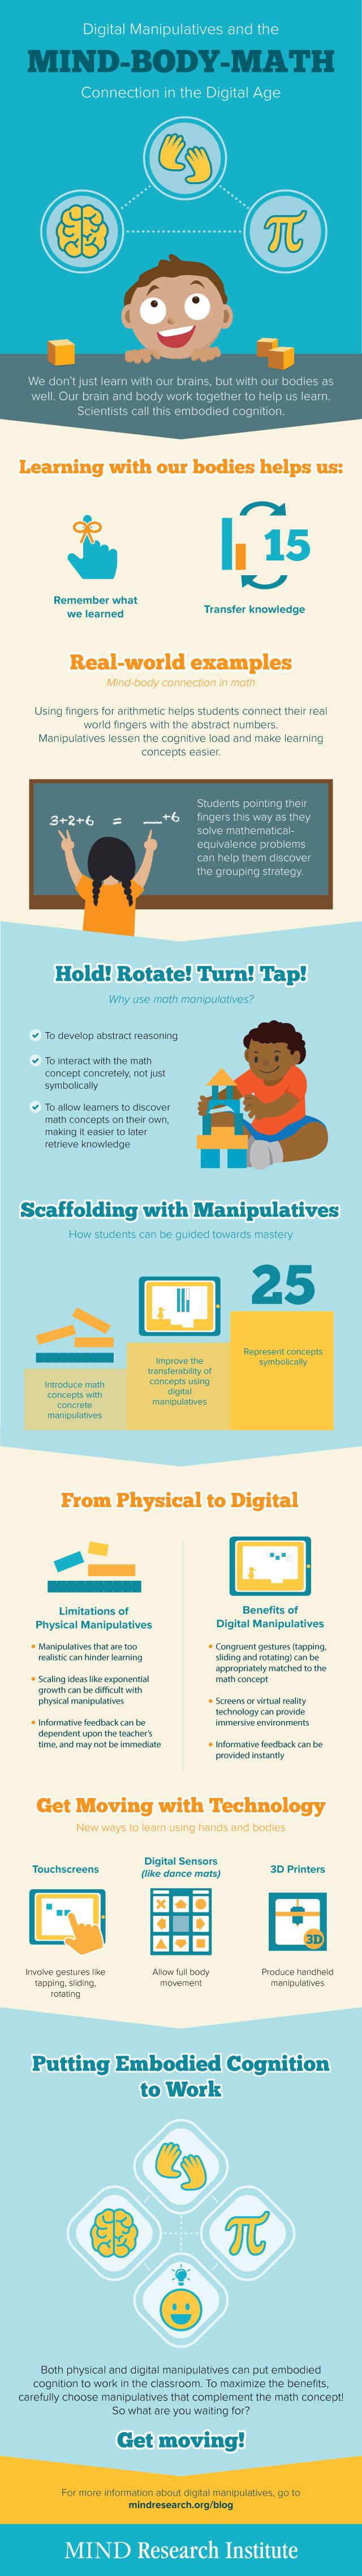 digital manipulatives infographic